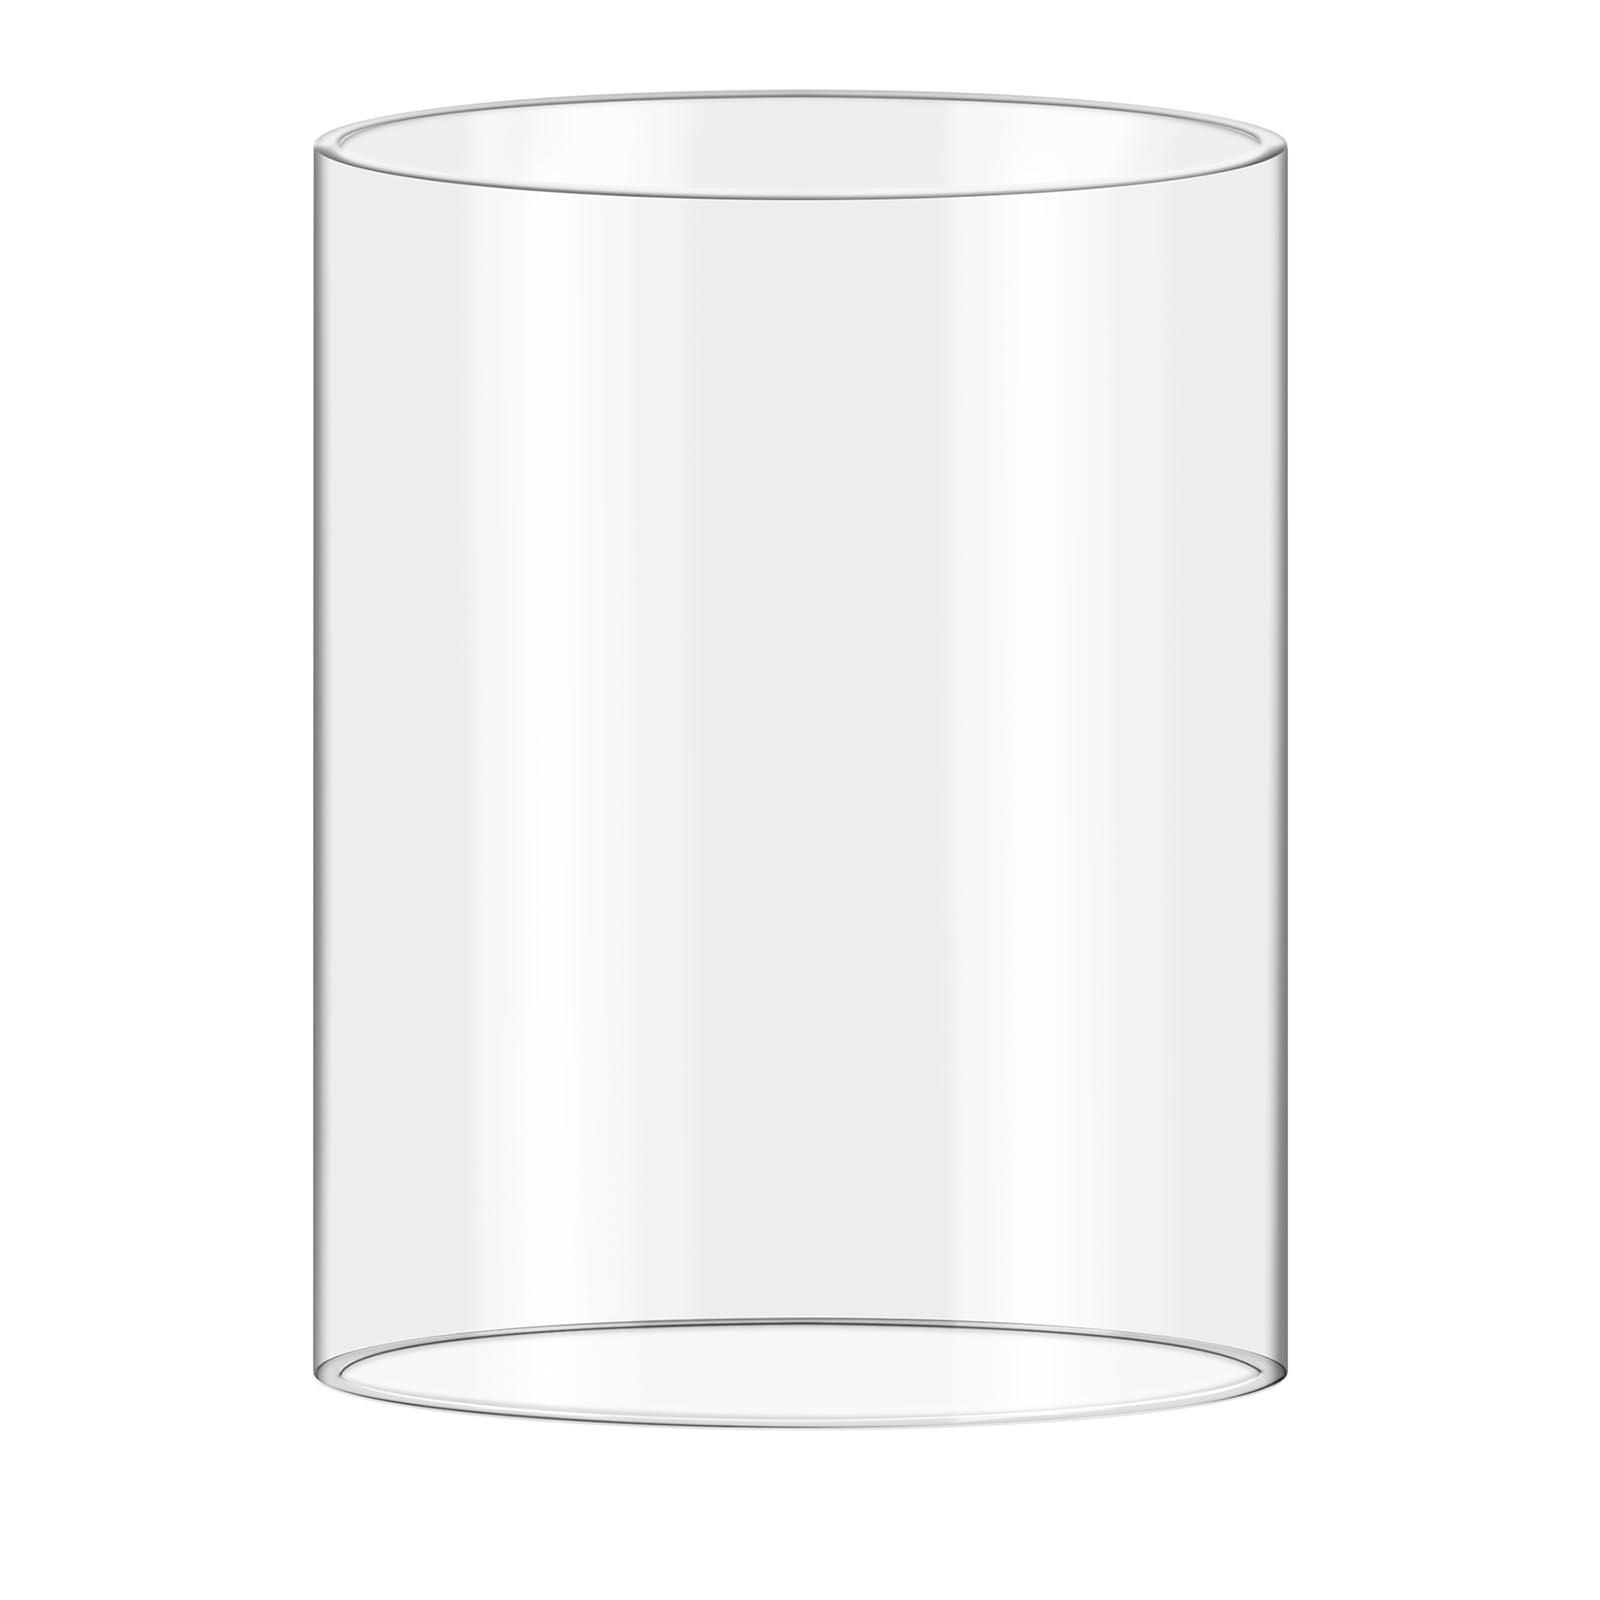 Cilindros de cristal